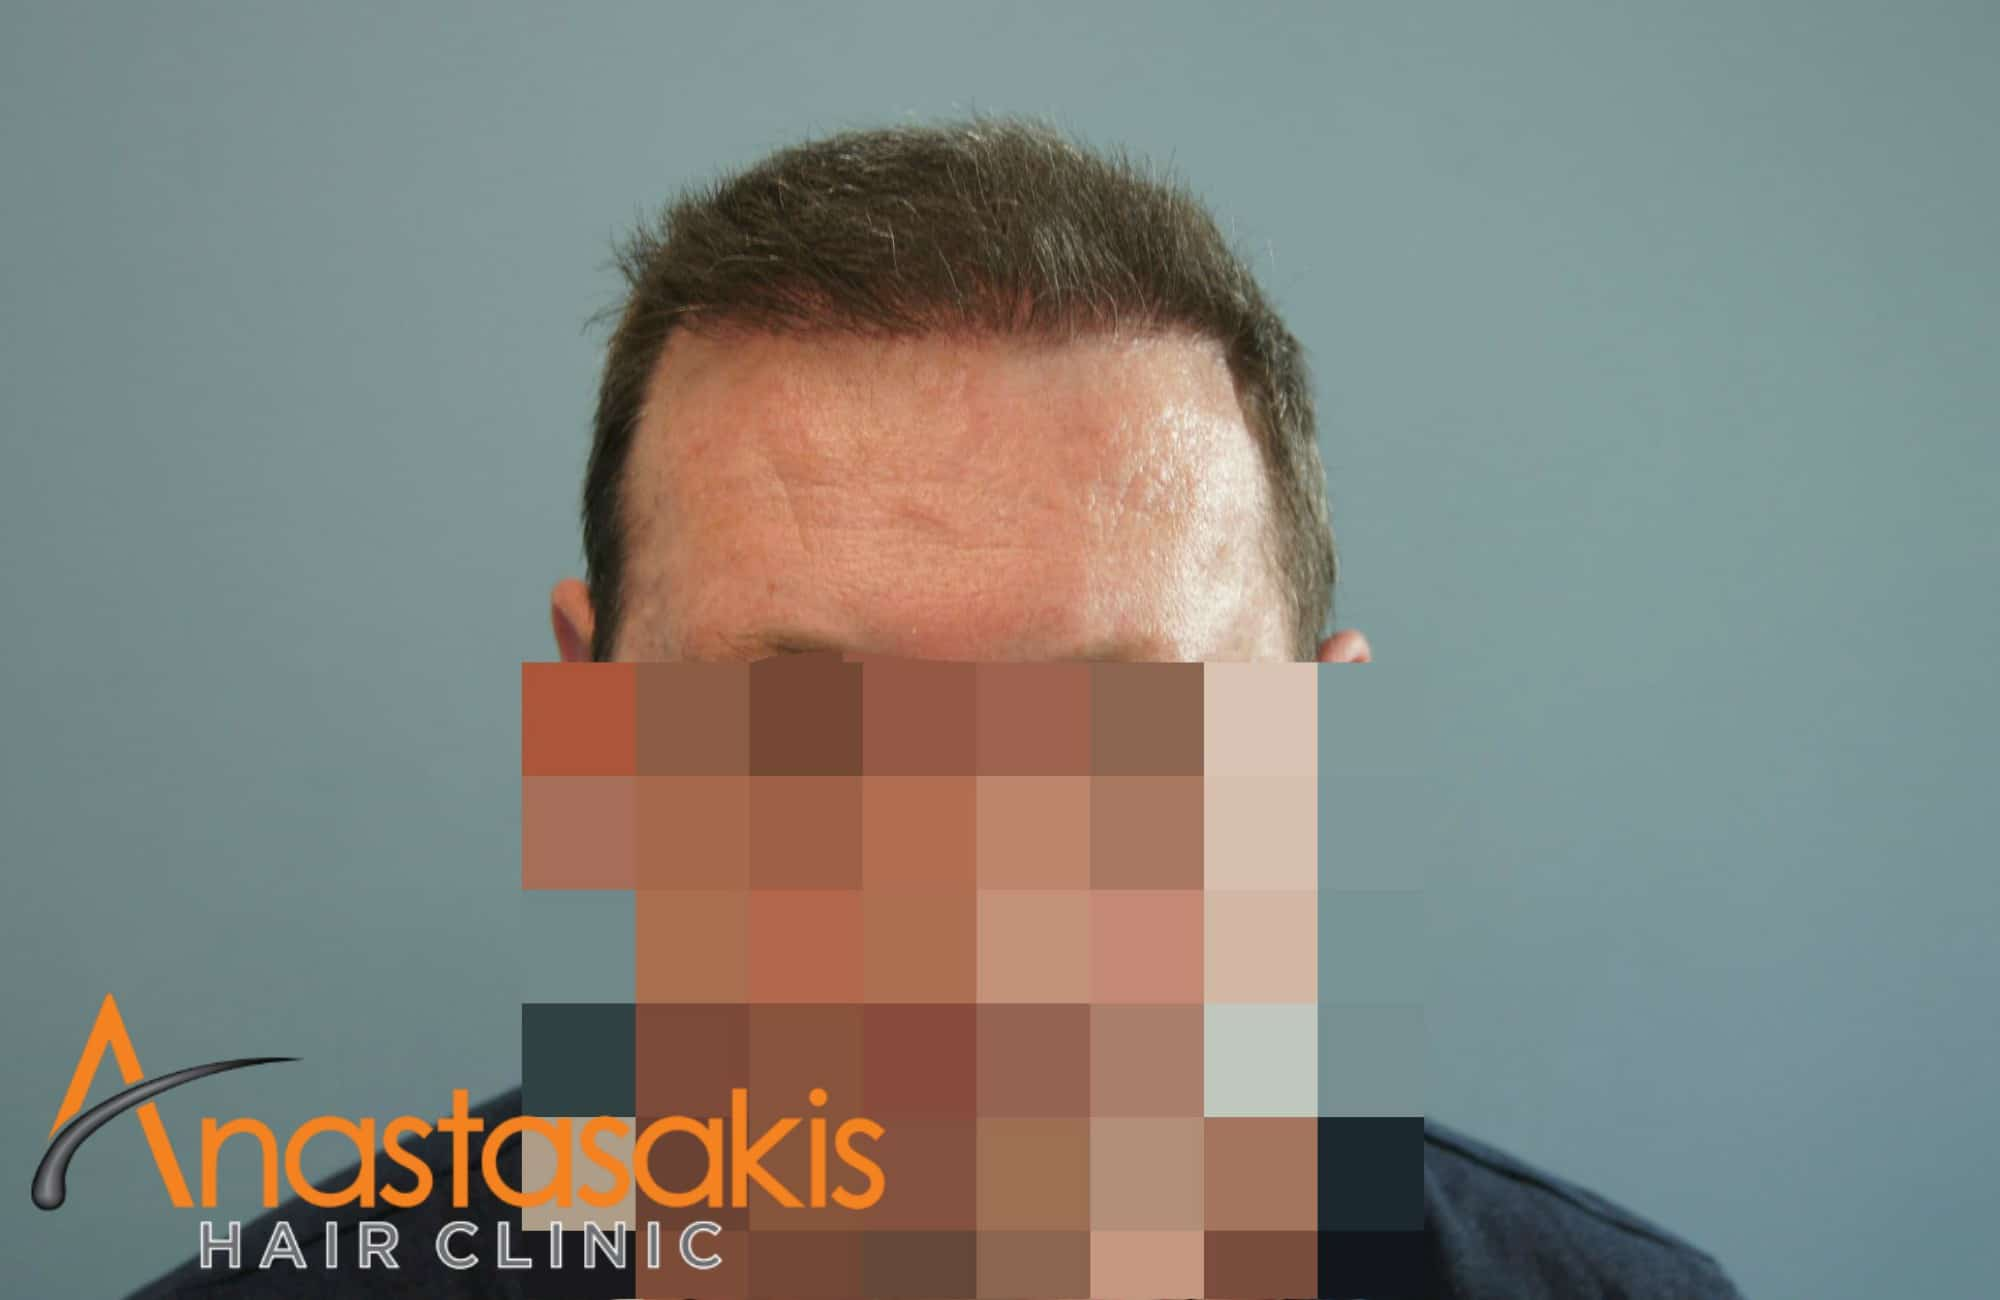 hairline και προσωπο ασθενούς έπειτα από επέμβαση με 3000 Fus